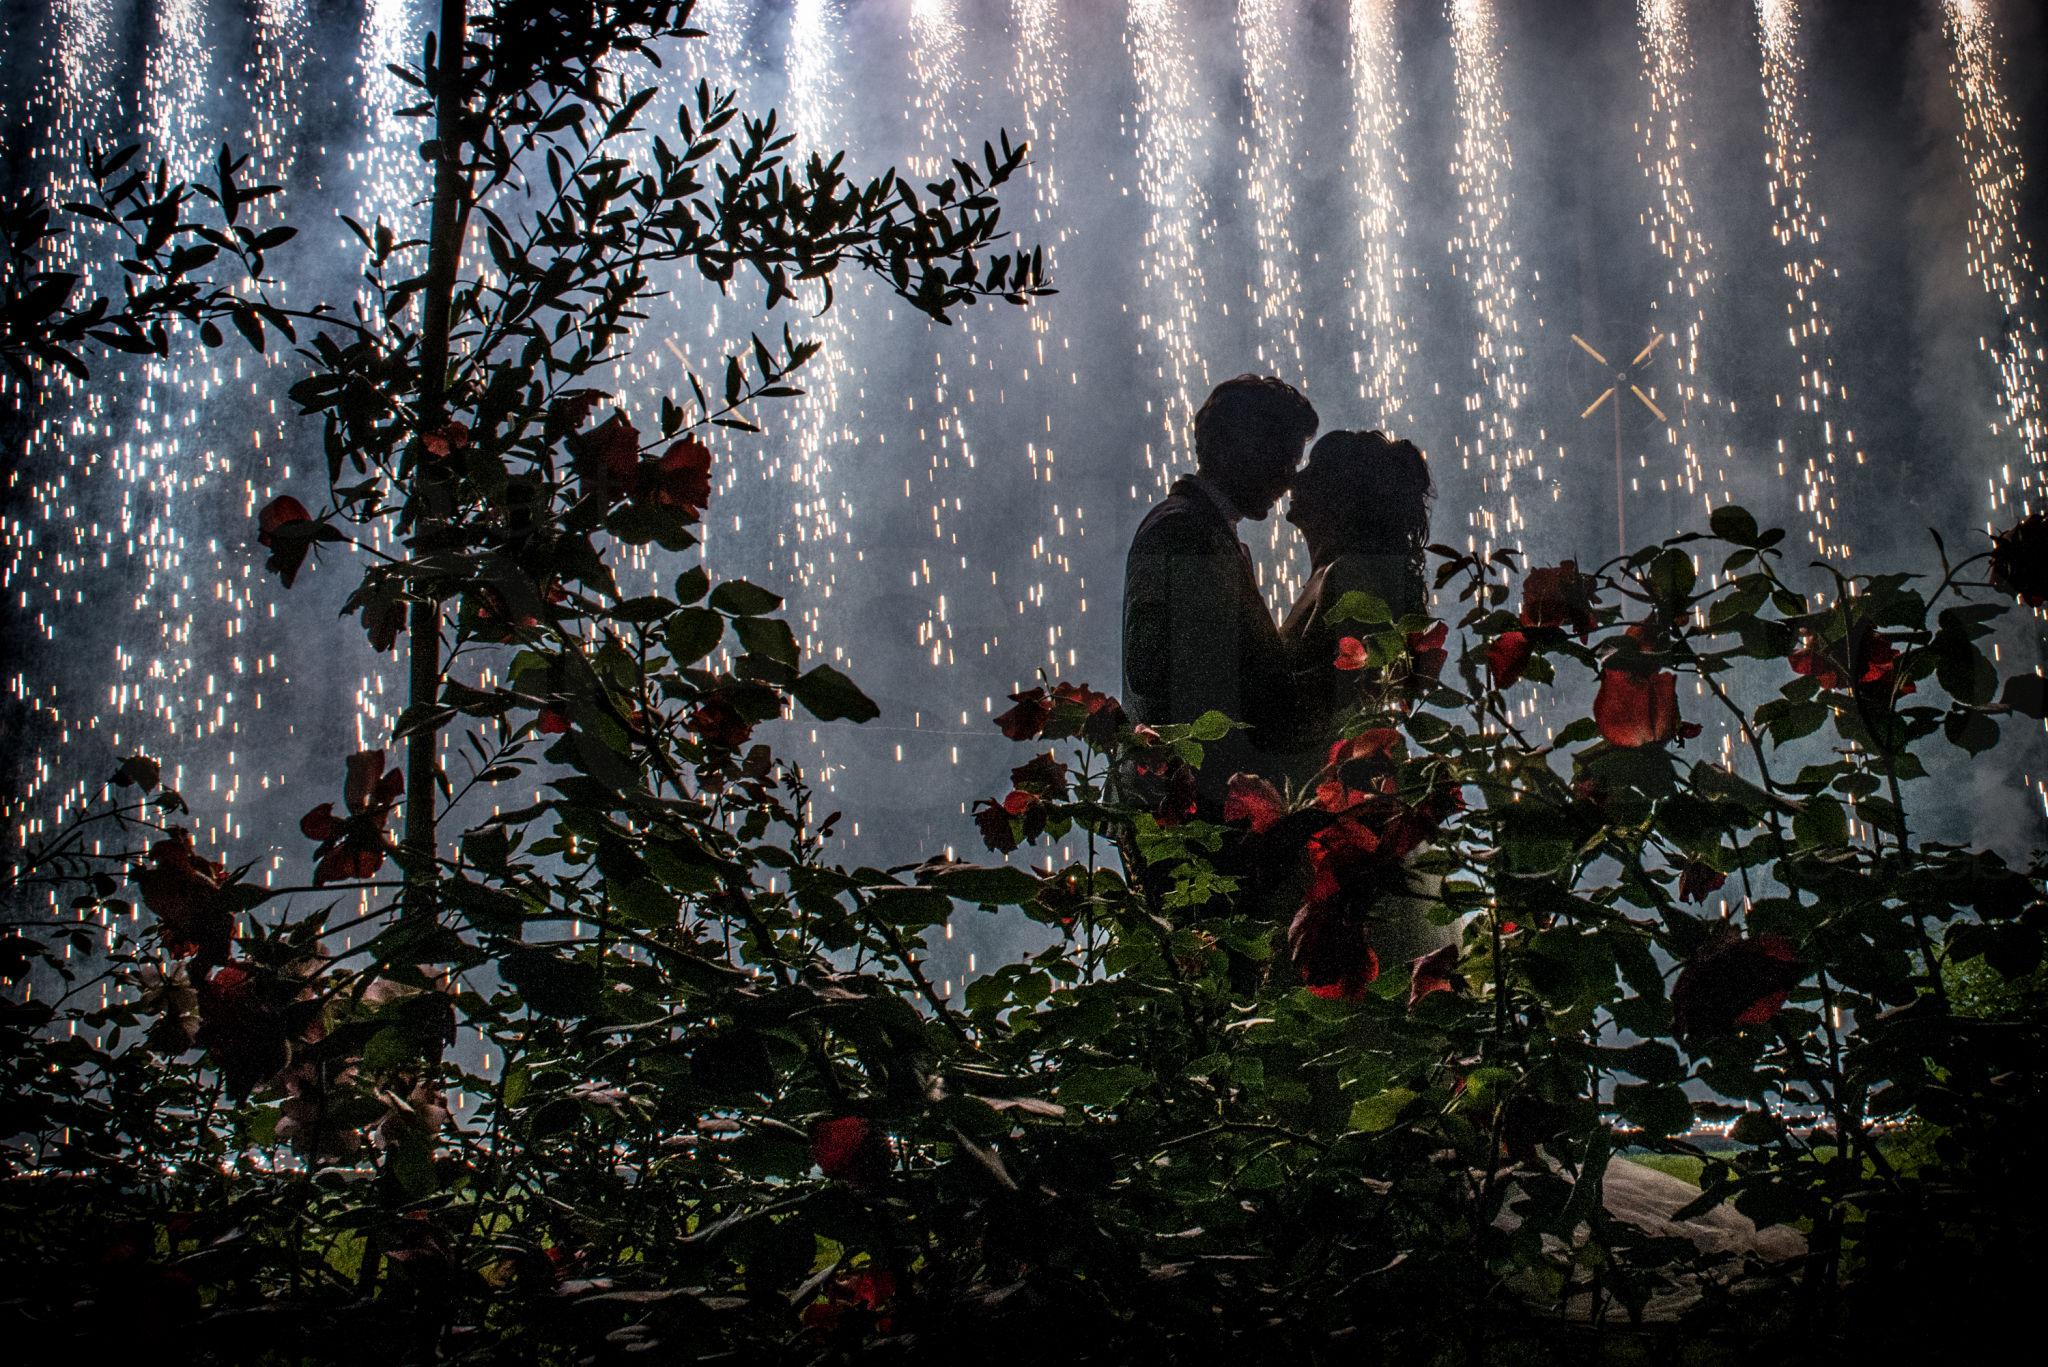 https://lnx.mirkone.it/wp-content/uploads/2015/07/fotografo-matrimoni-faenza-0025.jpg